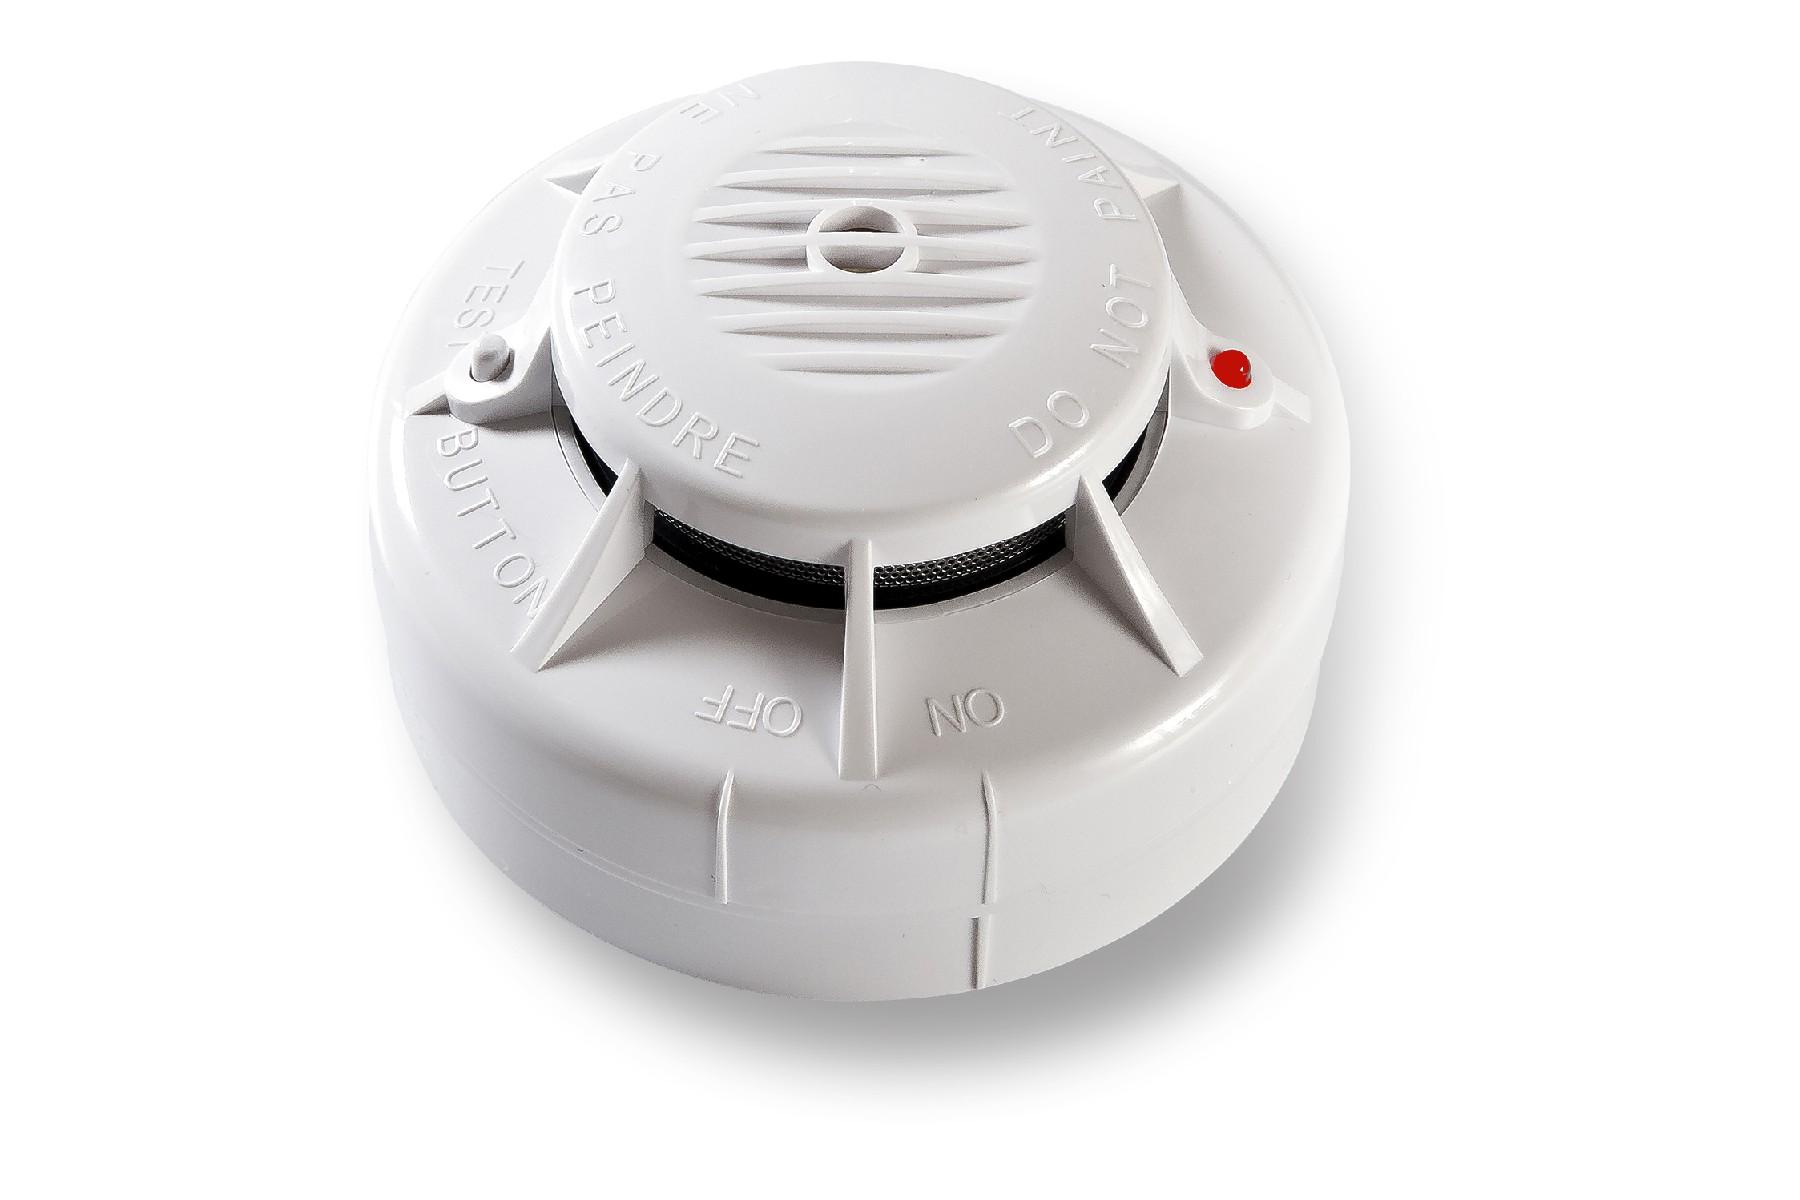 ASD-10QR 10-Jahres Funk-Rauchwarnmelder - Fito Products BVFito ...